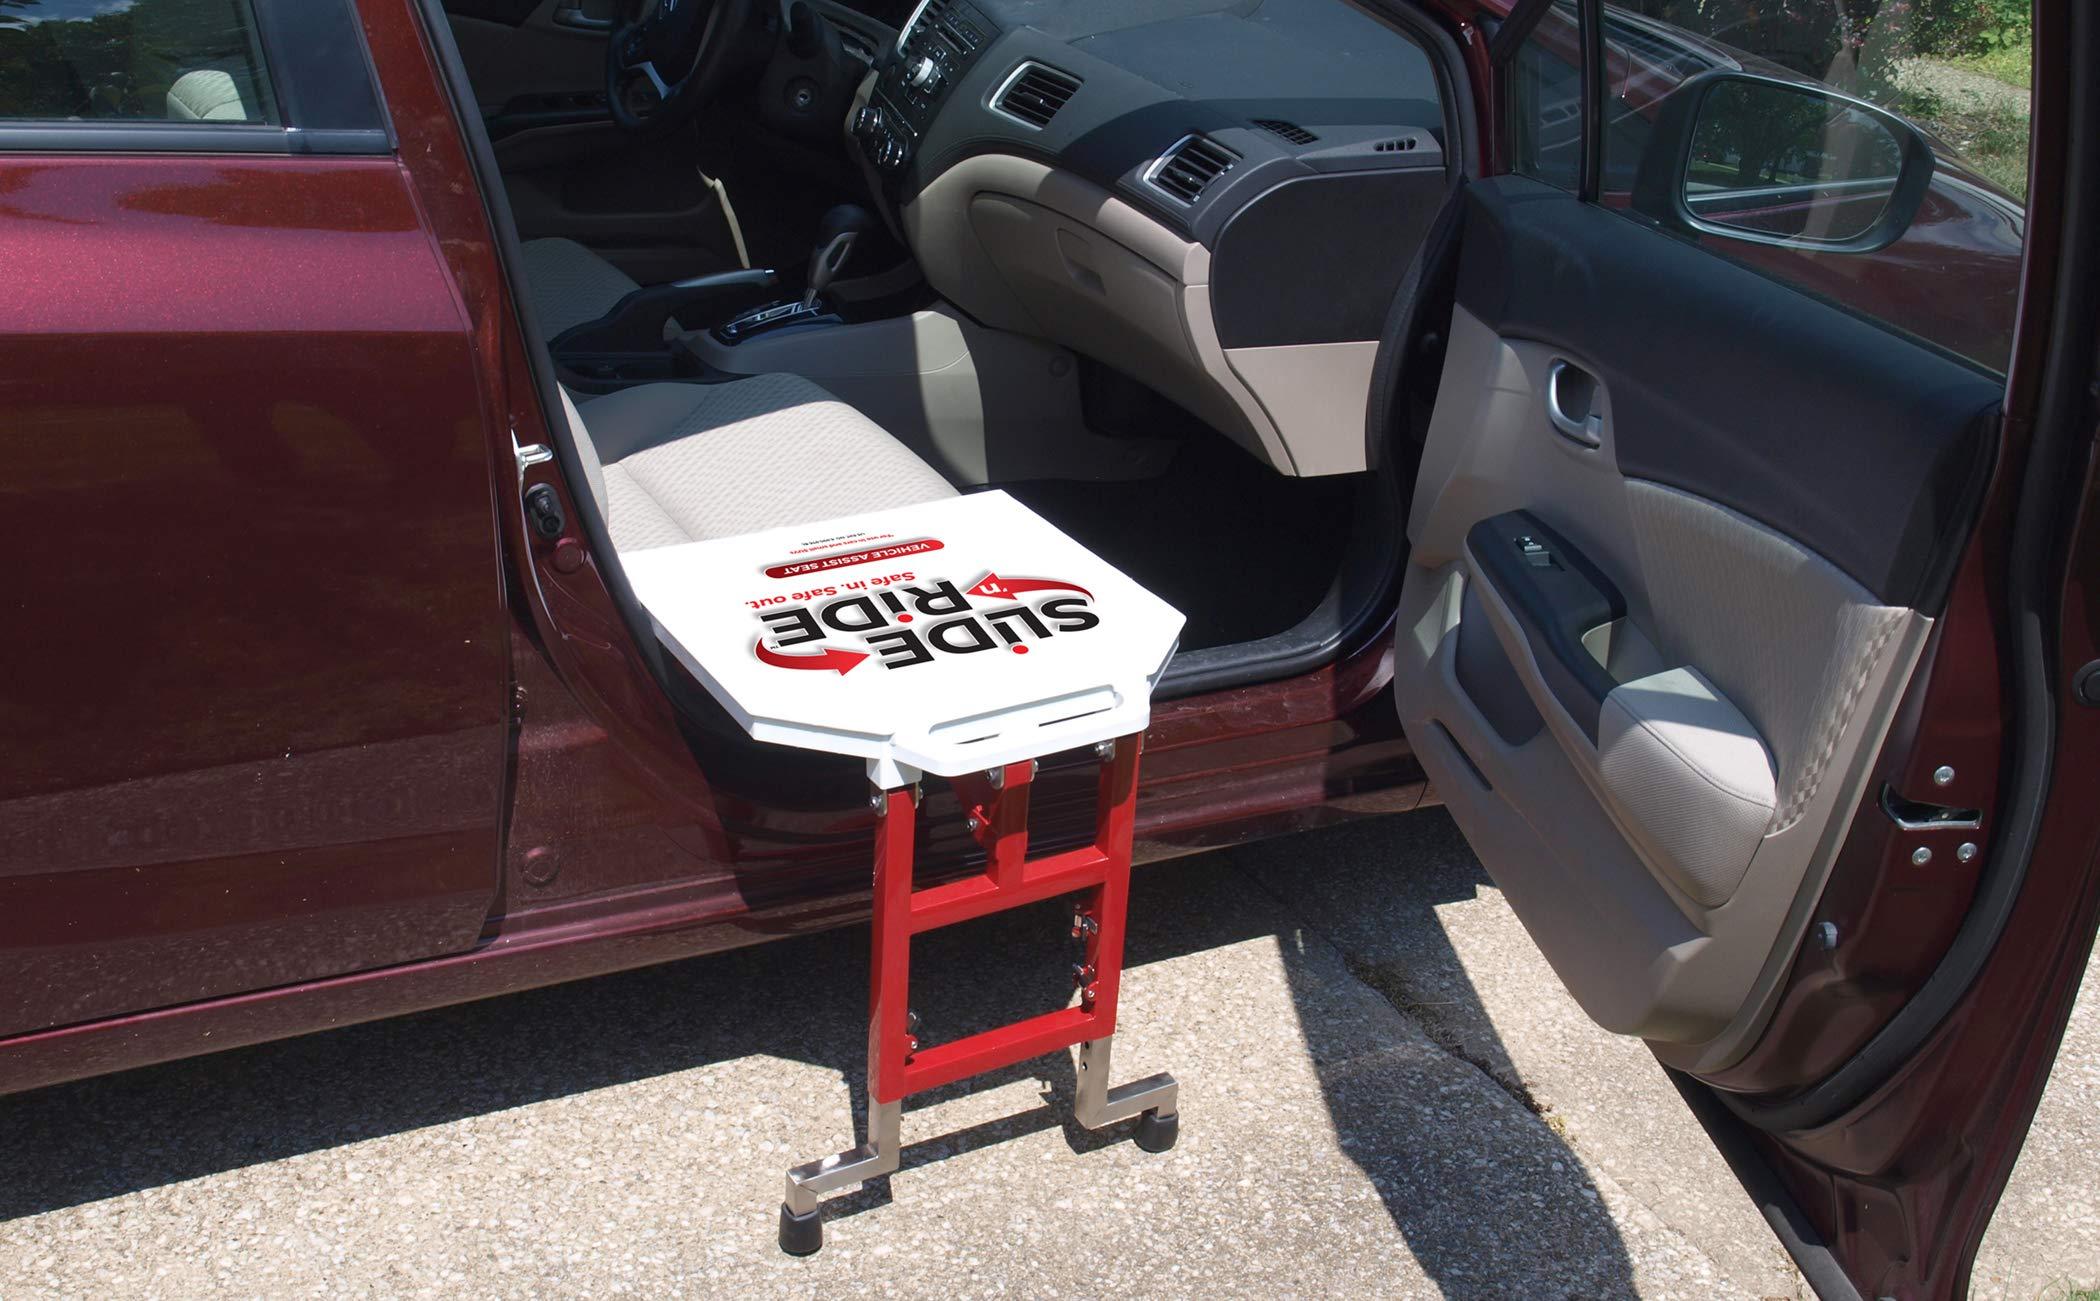 Slide 'n Ride Vehicle Transfer seat